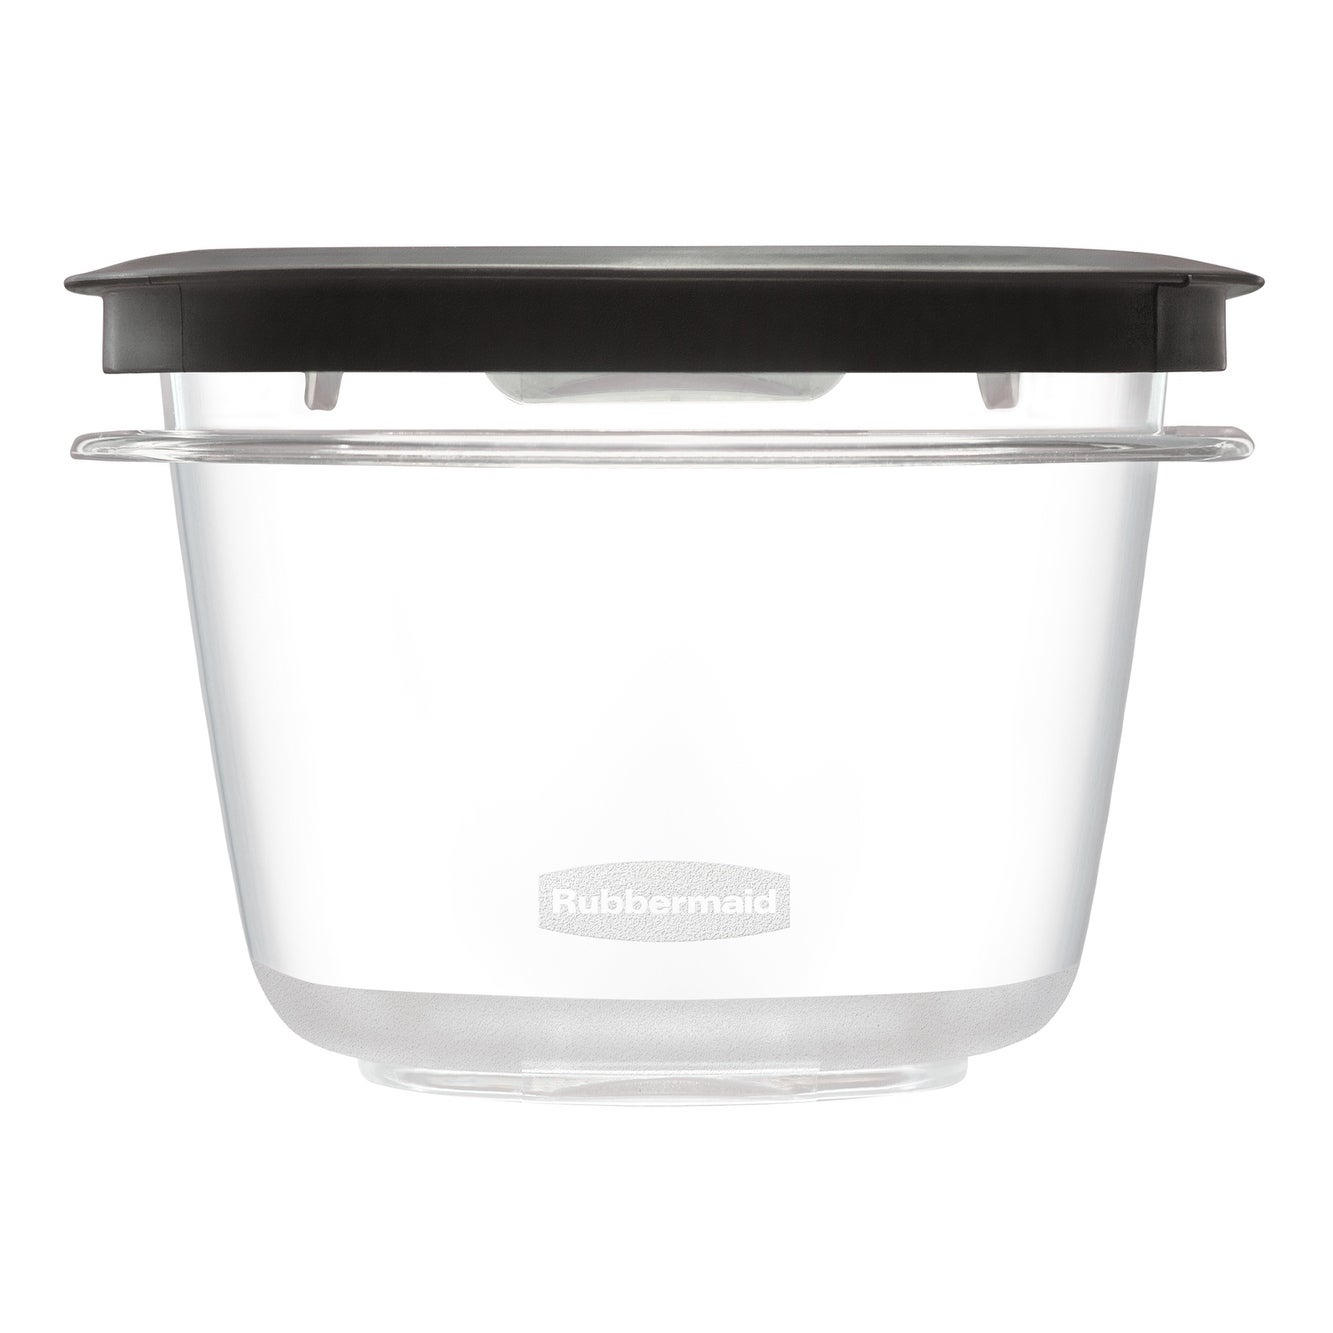 Rubbermaid 7H75TRCHILI 2 Cup Premier Food Storage Contain...